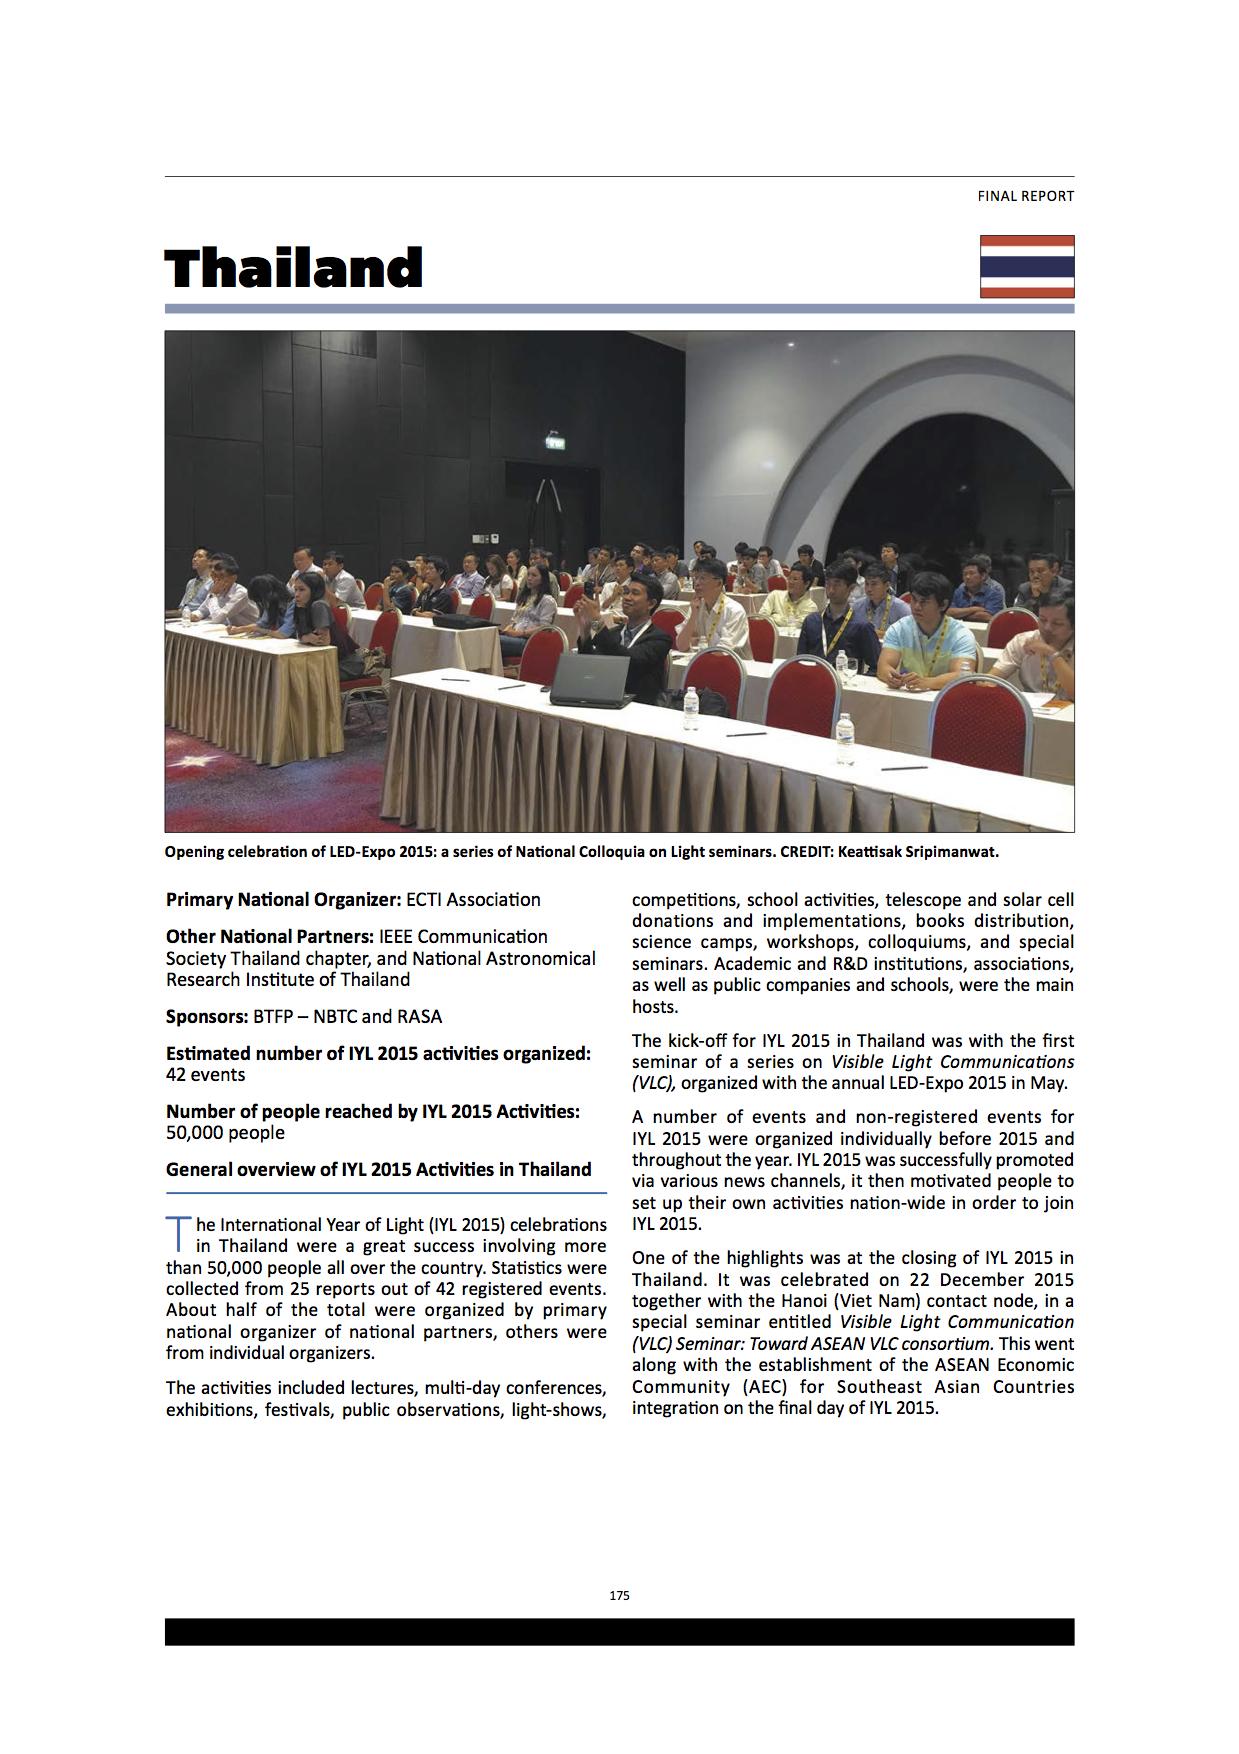 Thai-IYL2015-FInal-Report